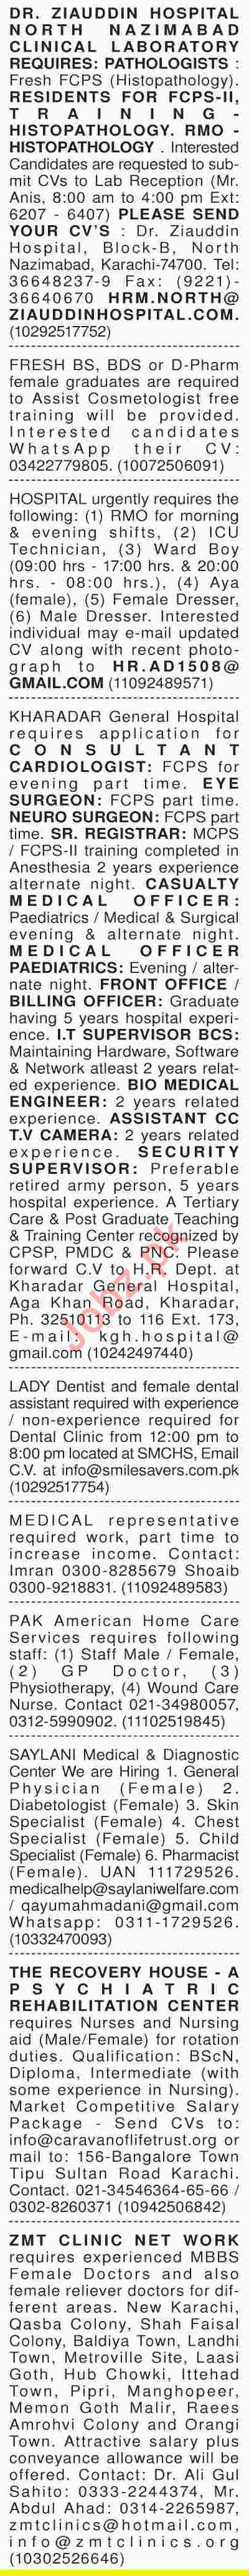 Dawn Sunday Newspaper Medical Classified Jobs 27/01/2019